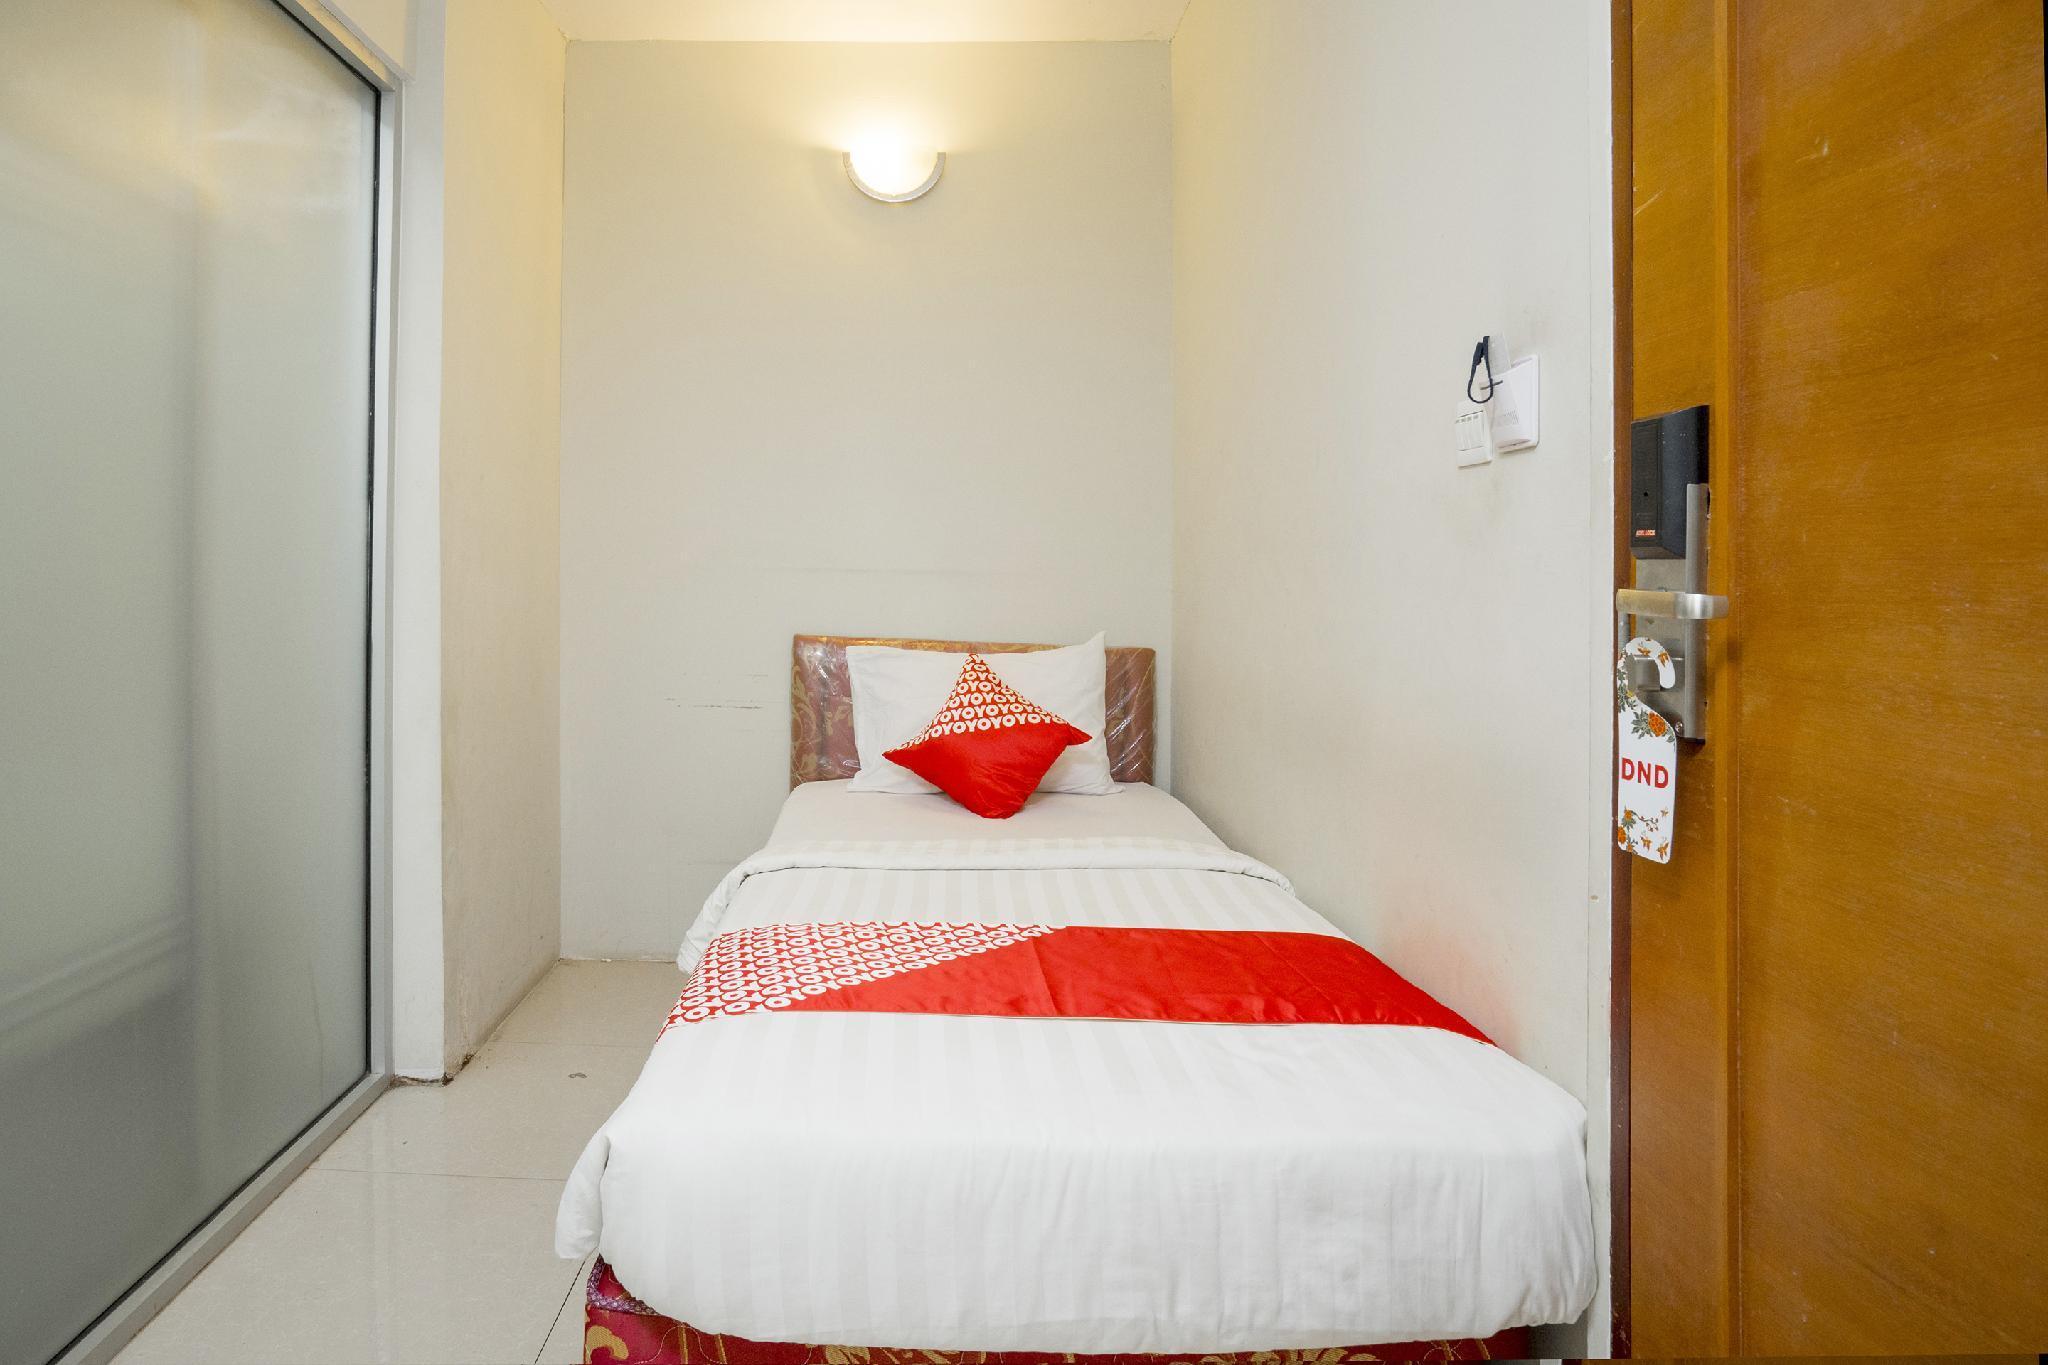 Radja Hotel Samarinda Booking Deals Photos Reviews